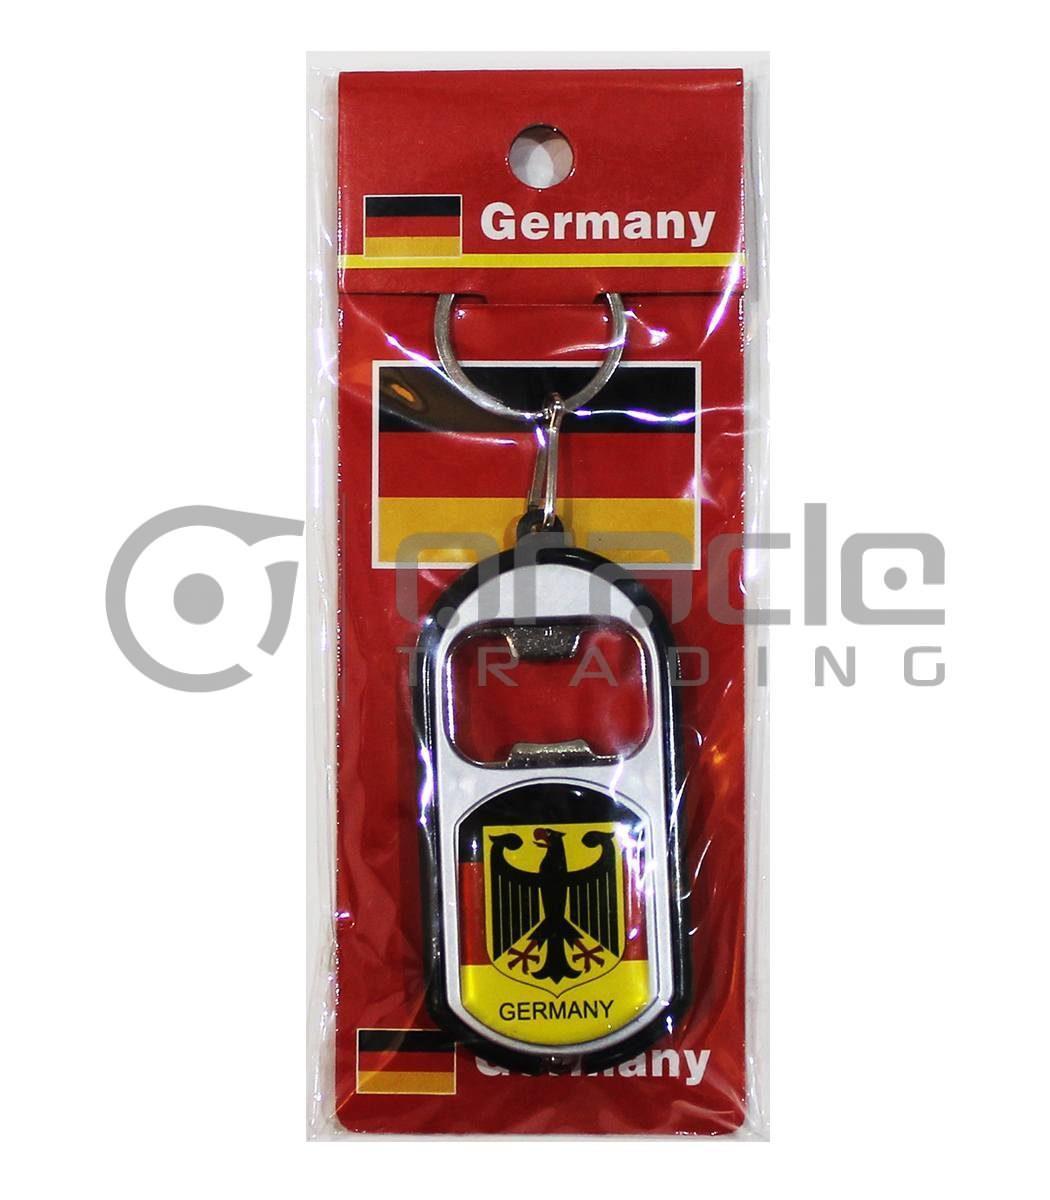 Germany Flashlight Bottle Opener Keychain 12-Pack